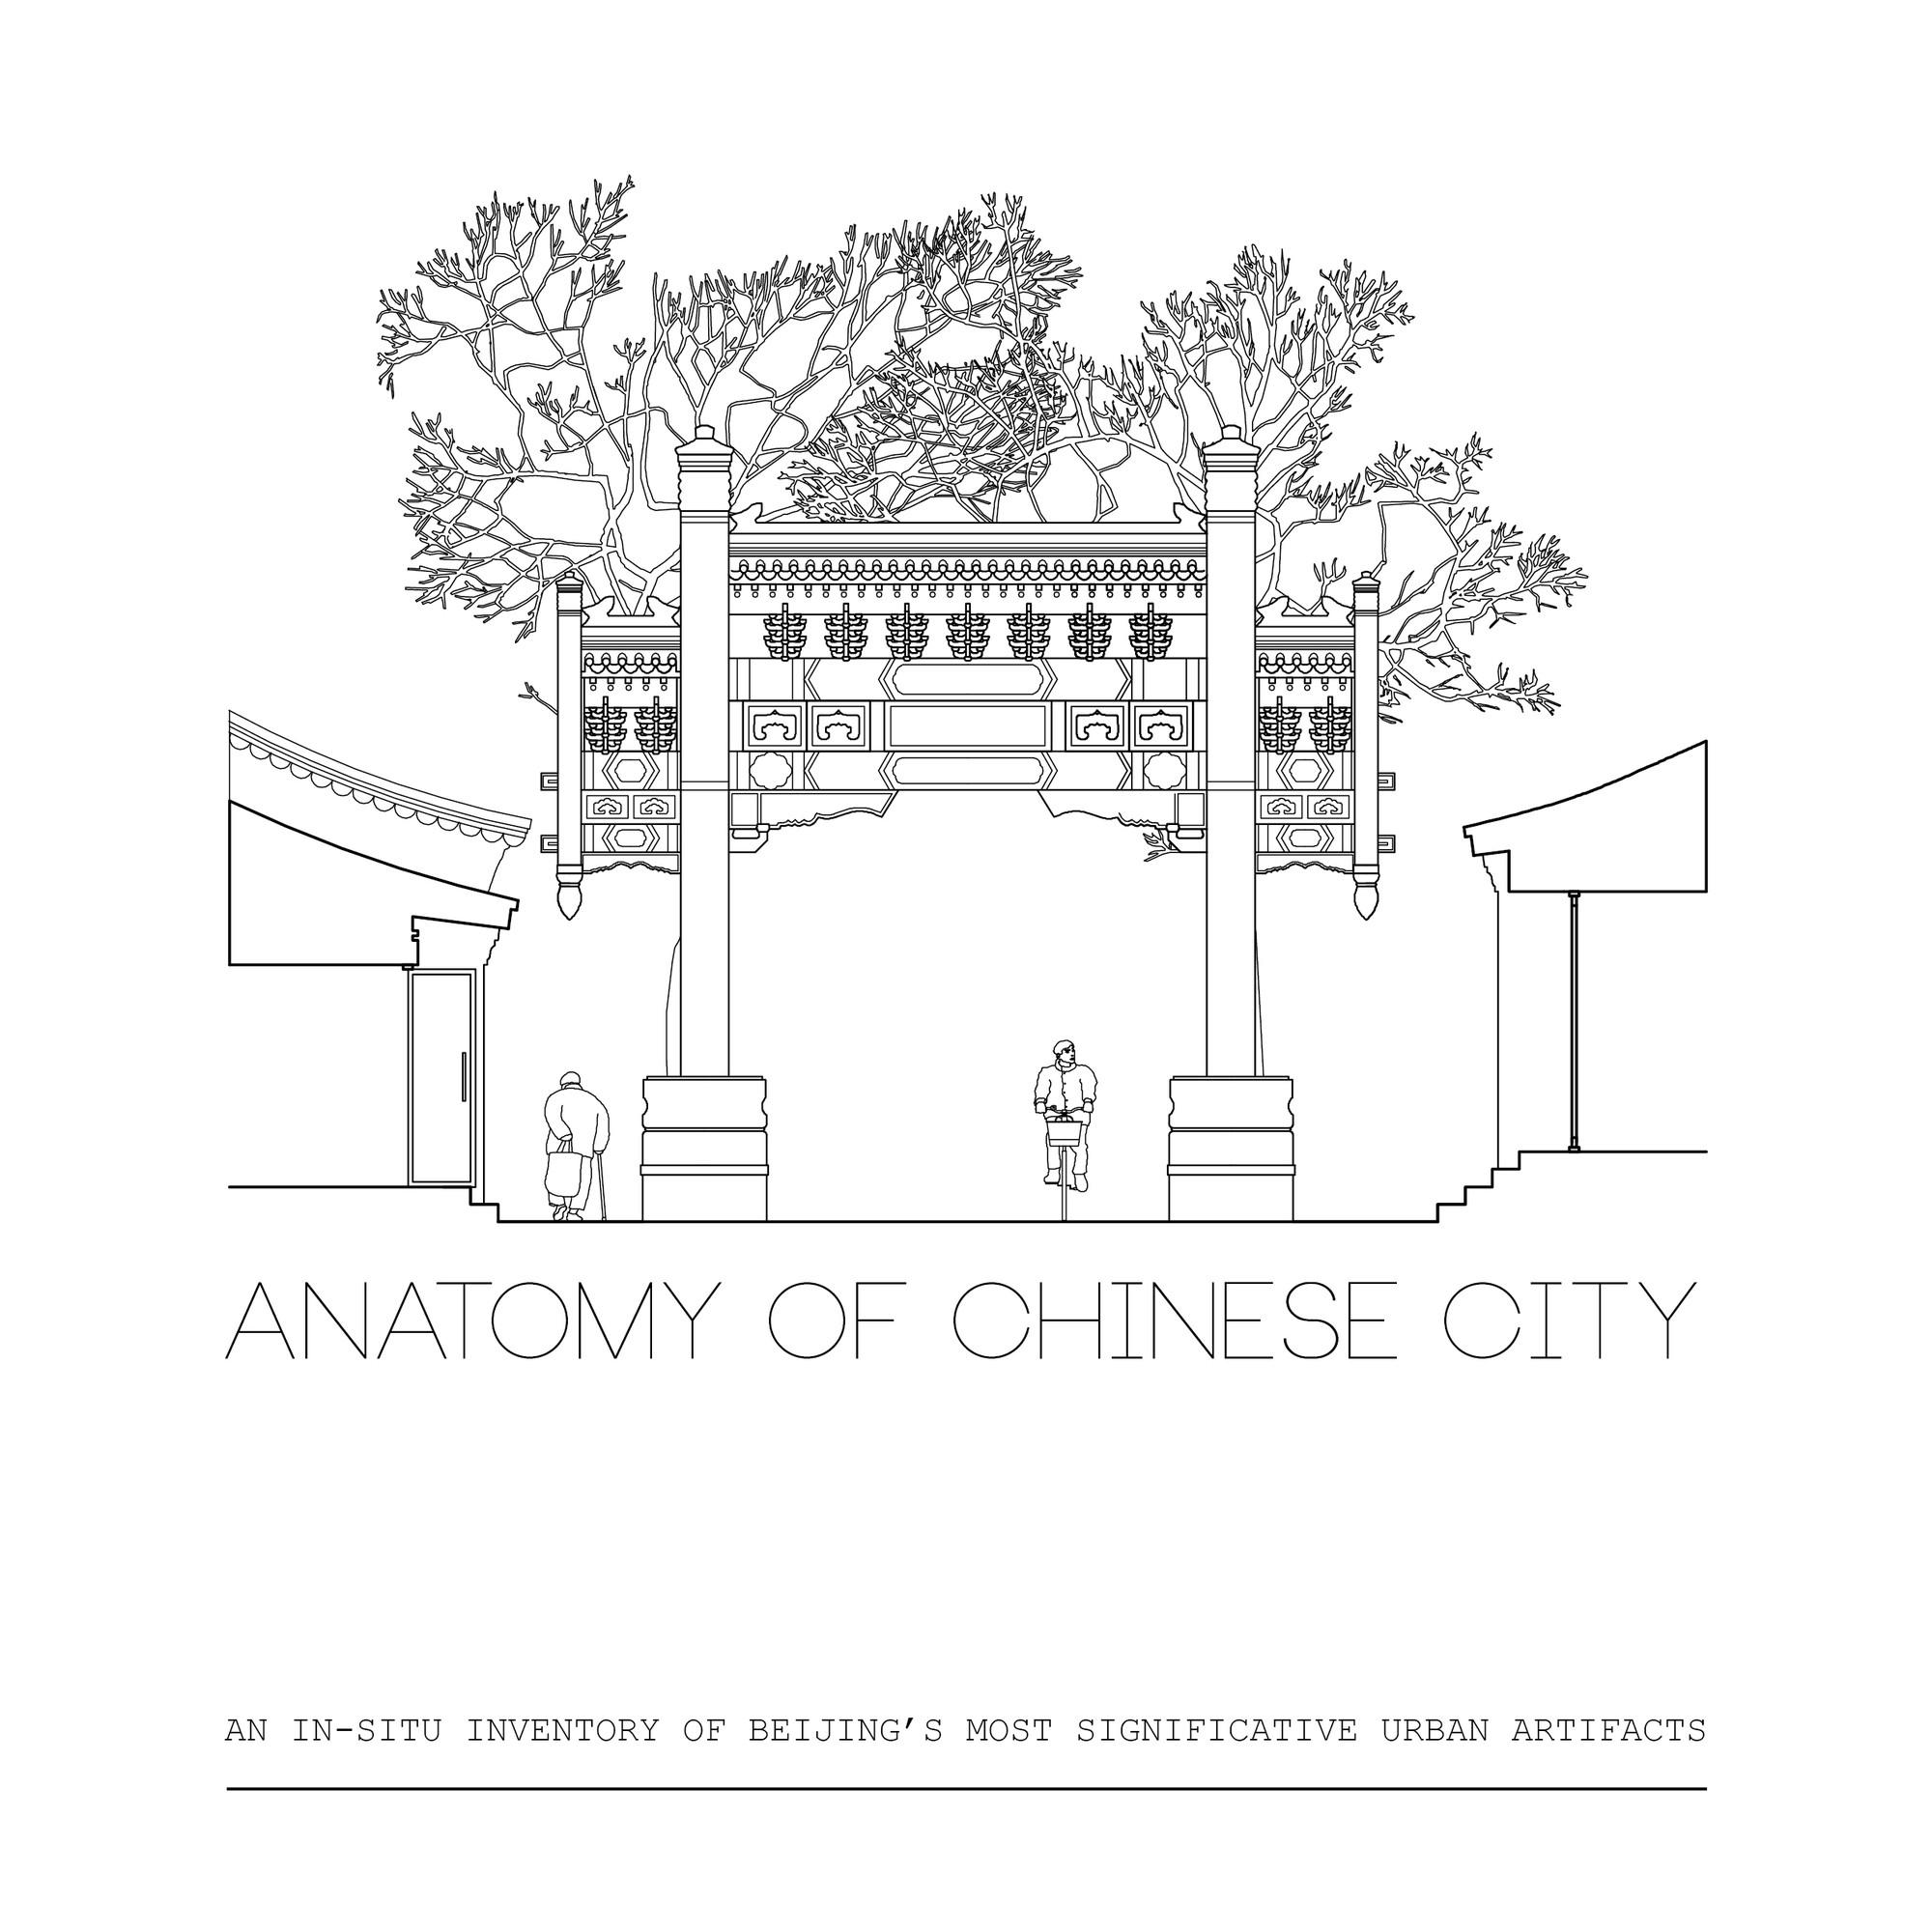 Anatomy of a Chinese City, Courtesy of Thomas Batzenschlager and Clémence Pybaro